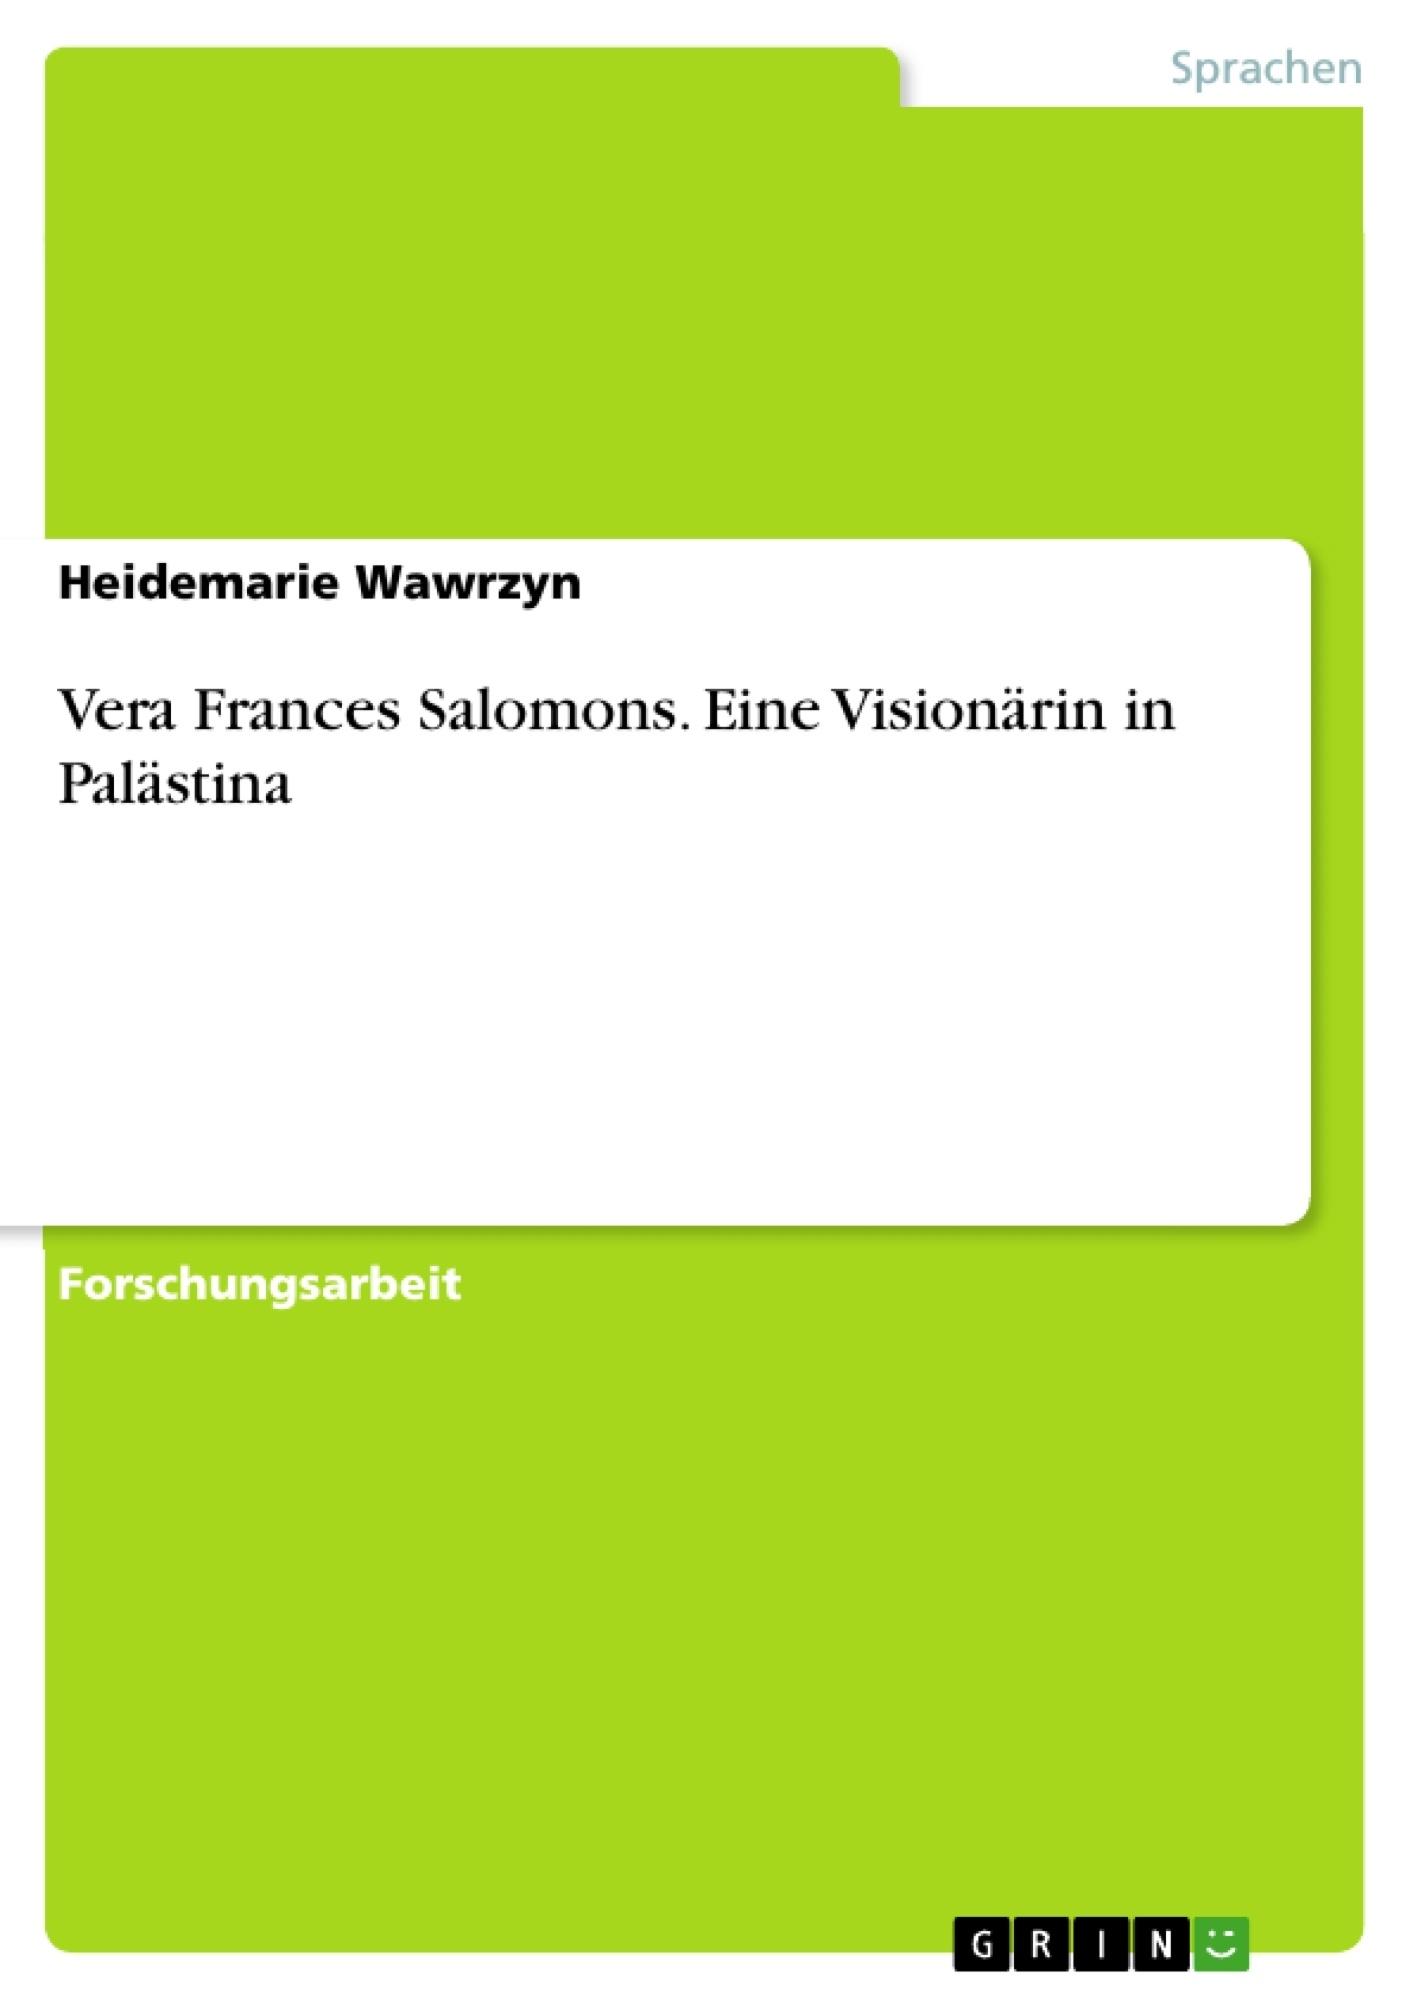 Titel: Vera Frances Salomons. Eine Visionärin in Palästina